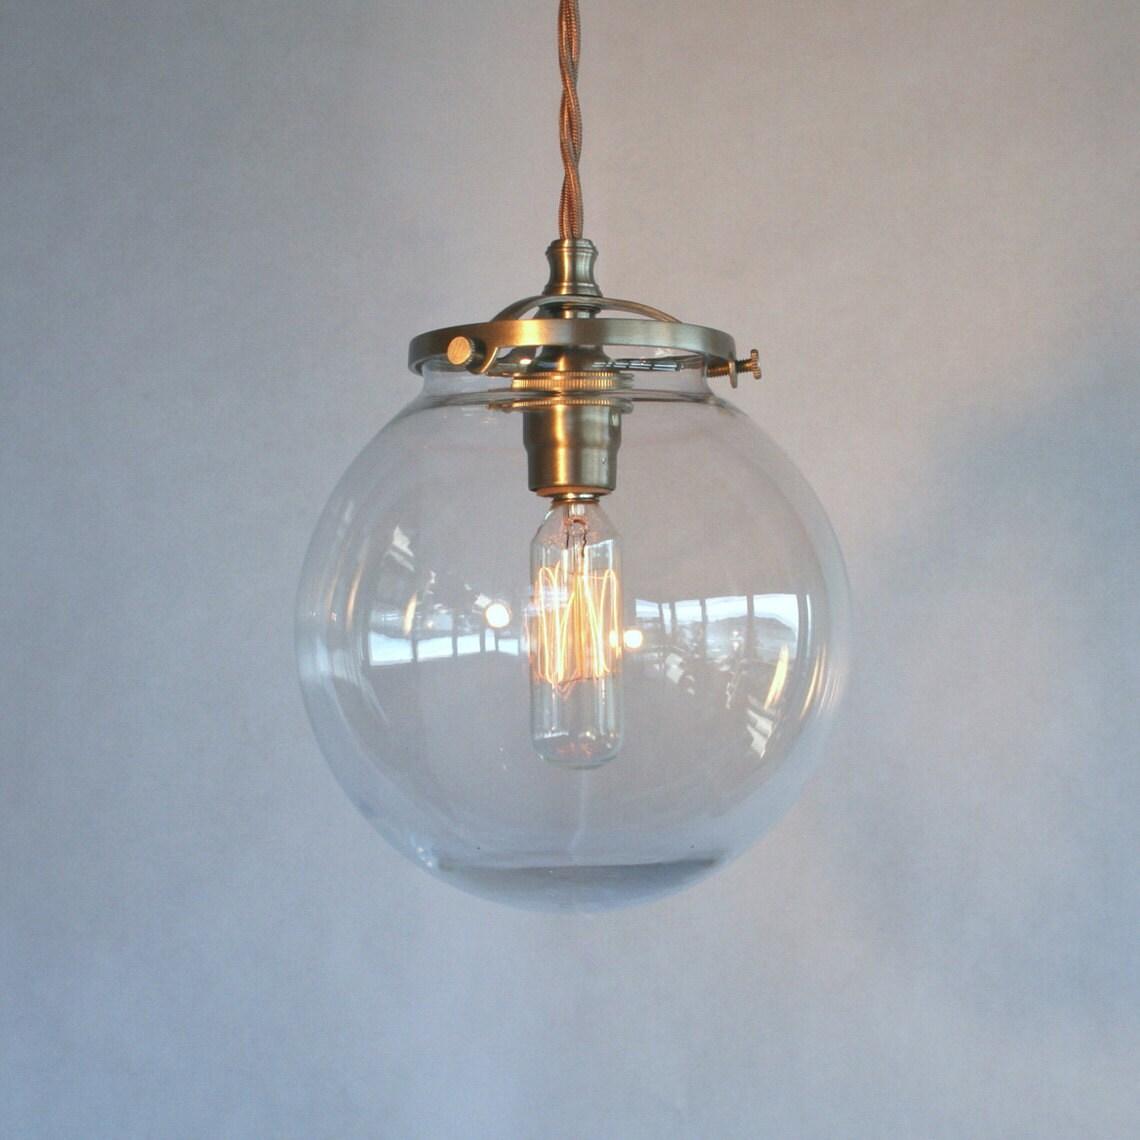 Clear Globe Pendant Light 6 Globe Modern Vintage